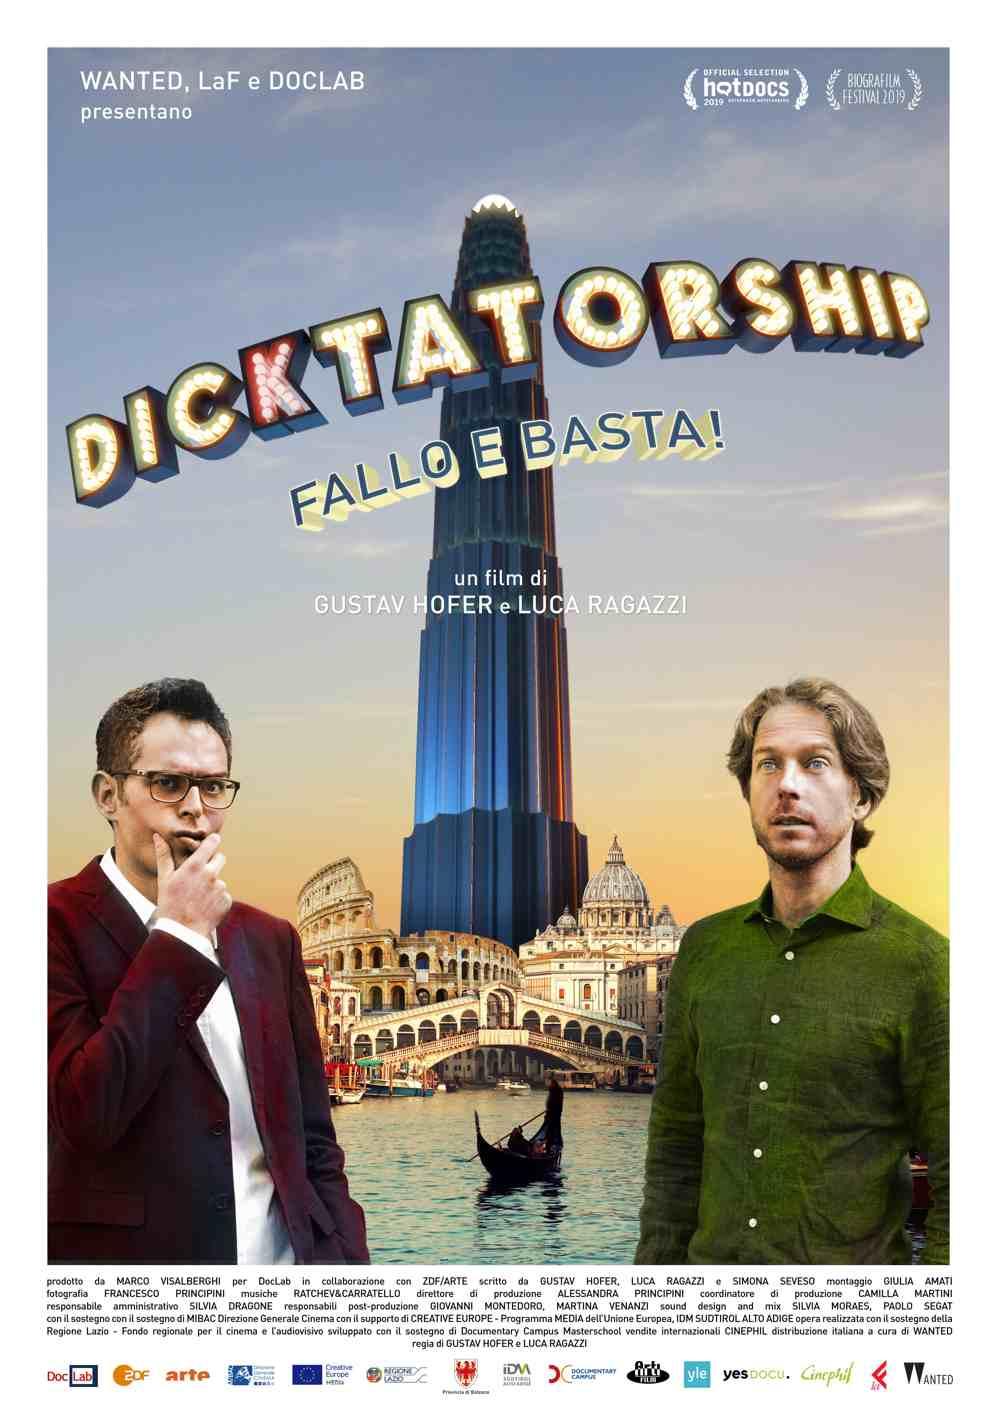 Dicktatorship – Fallo e basta!